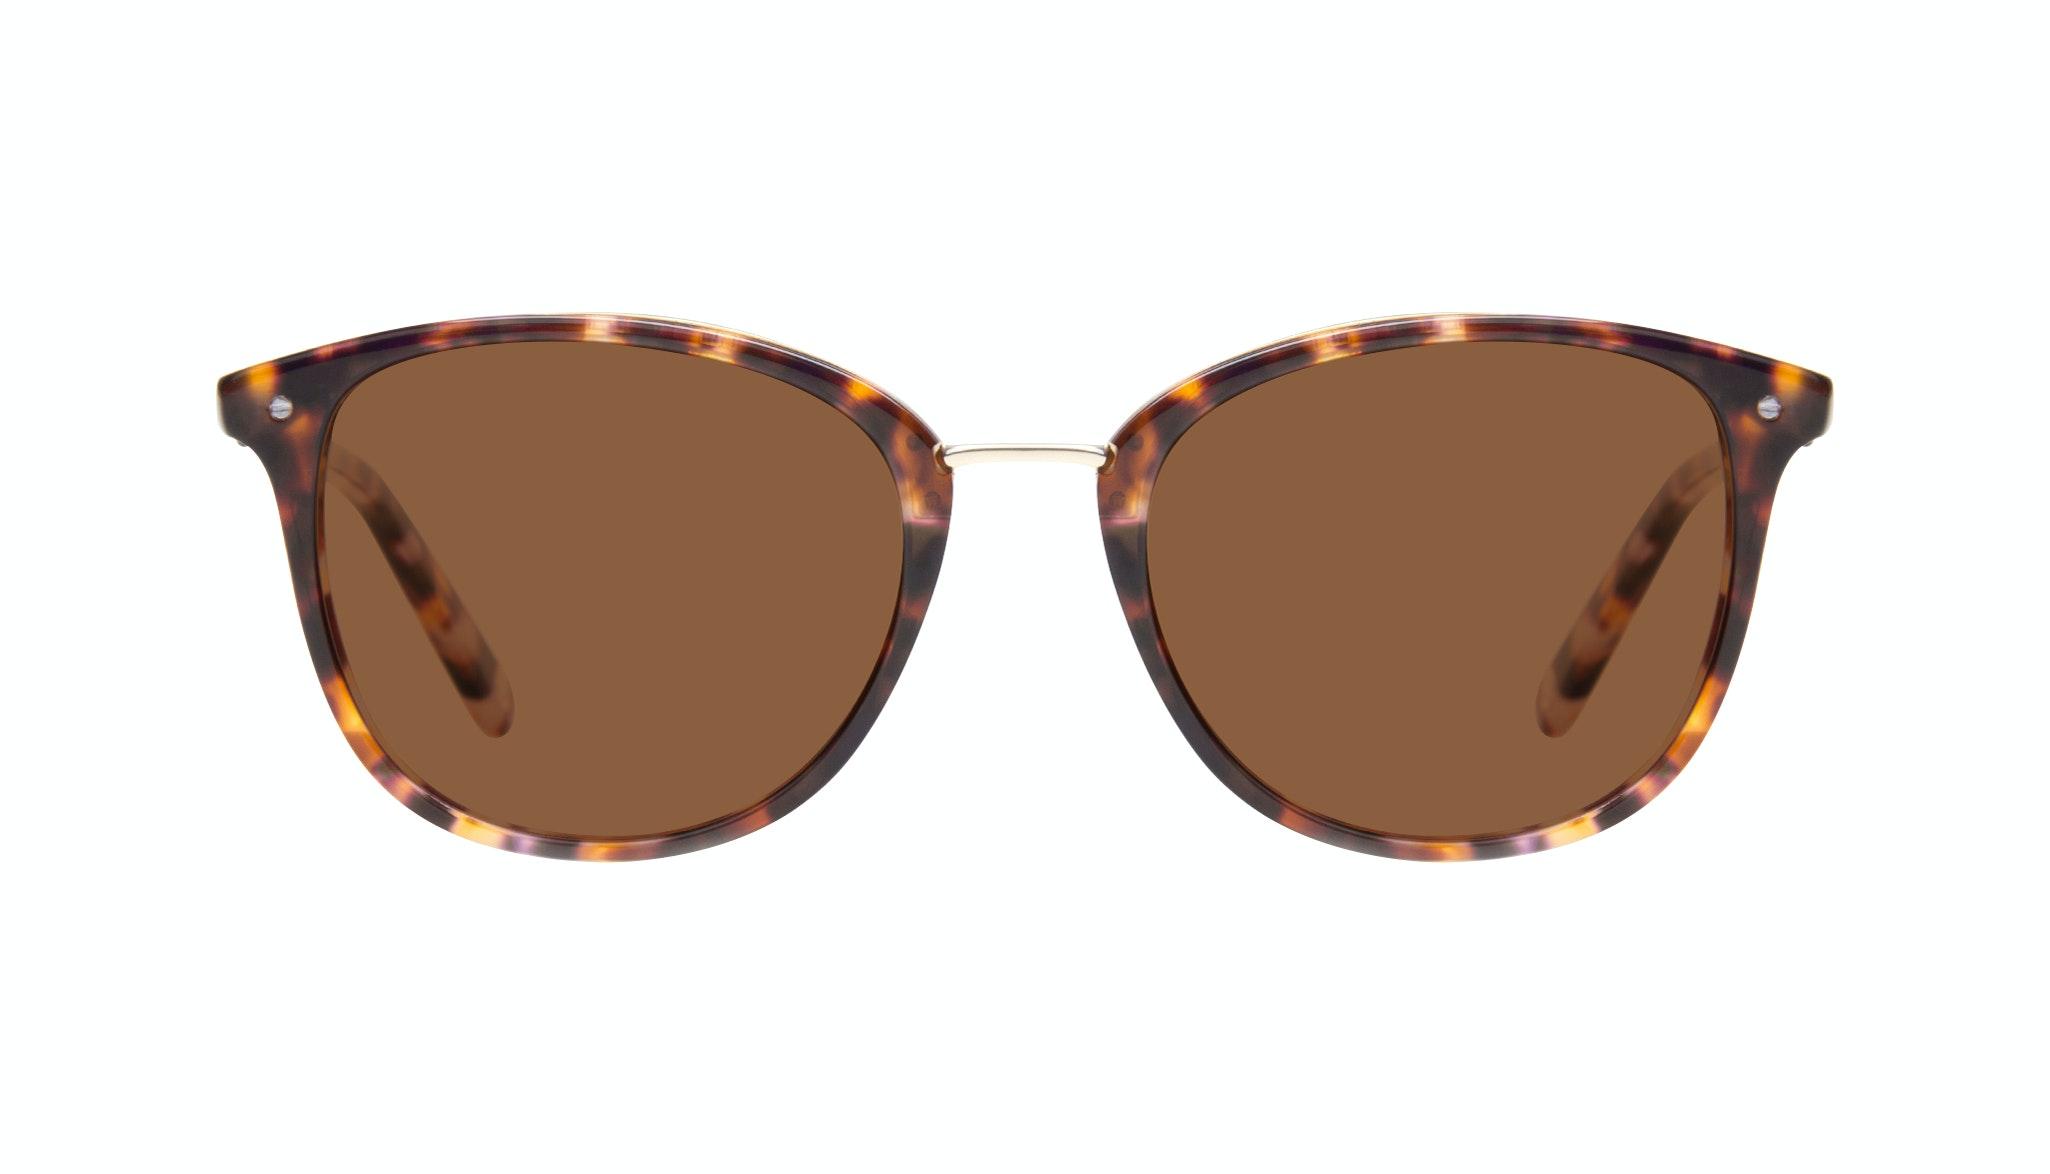 Affordable Fashion Glasses Square Round Sunglasses Women Bella Dark Tortoise